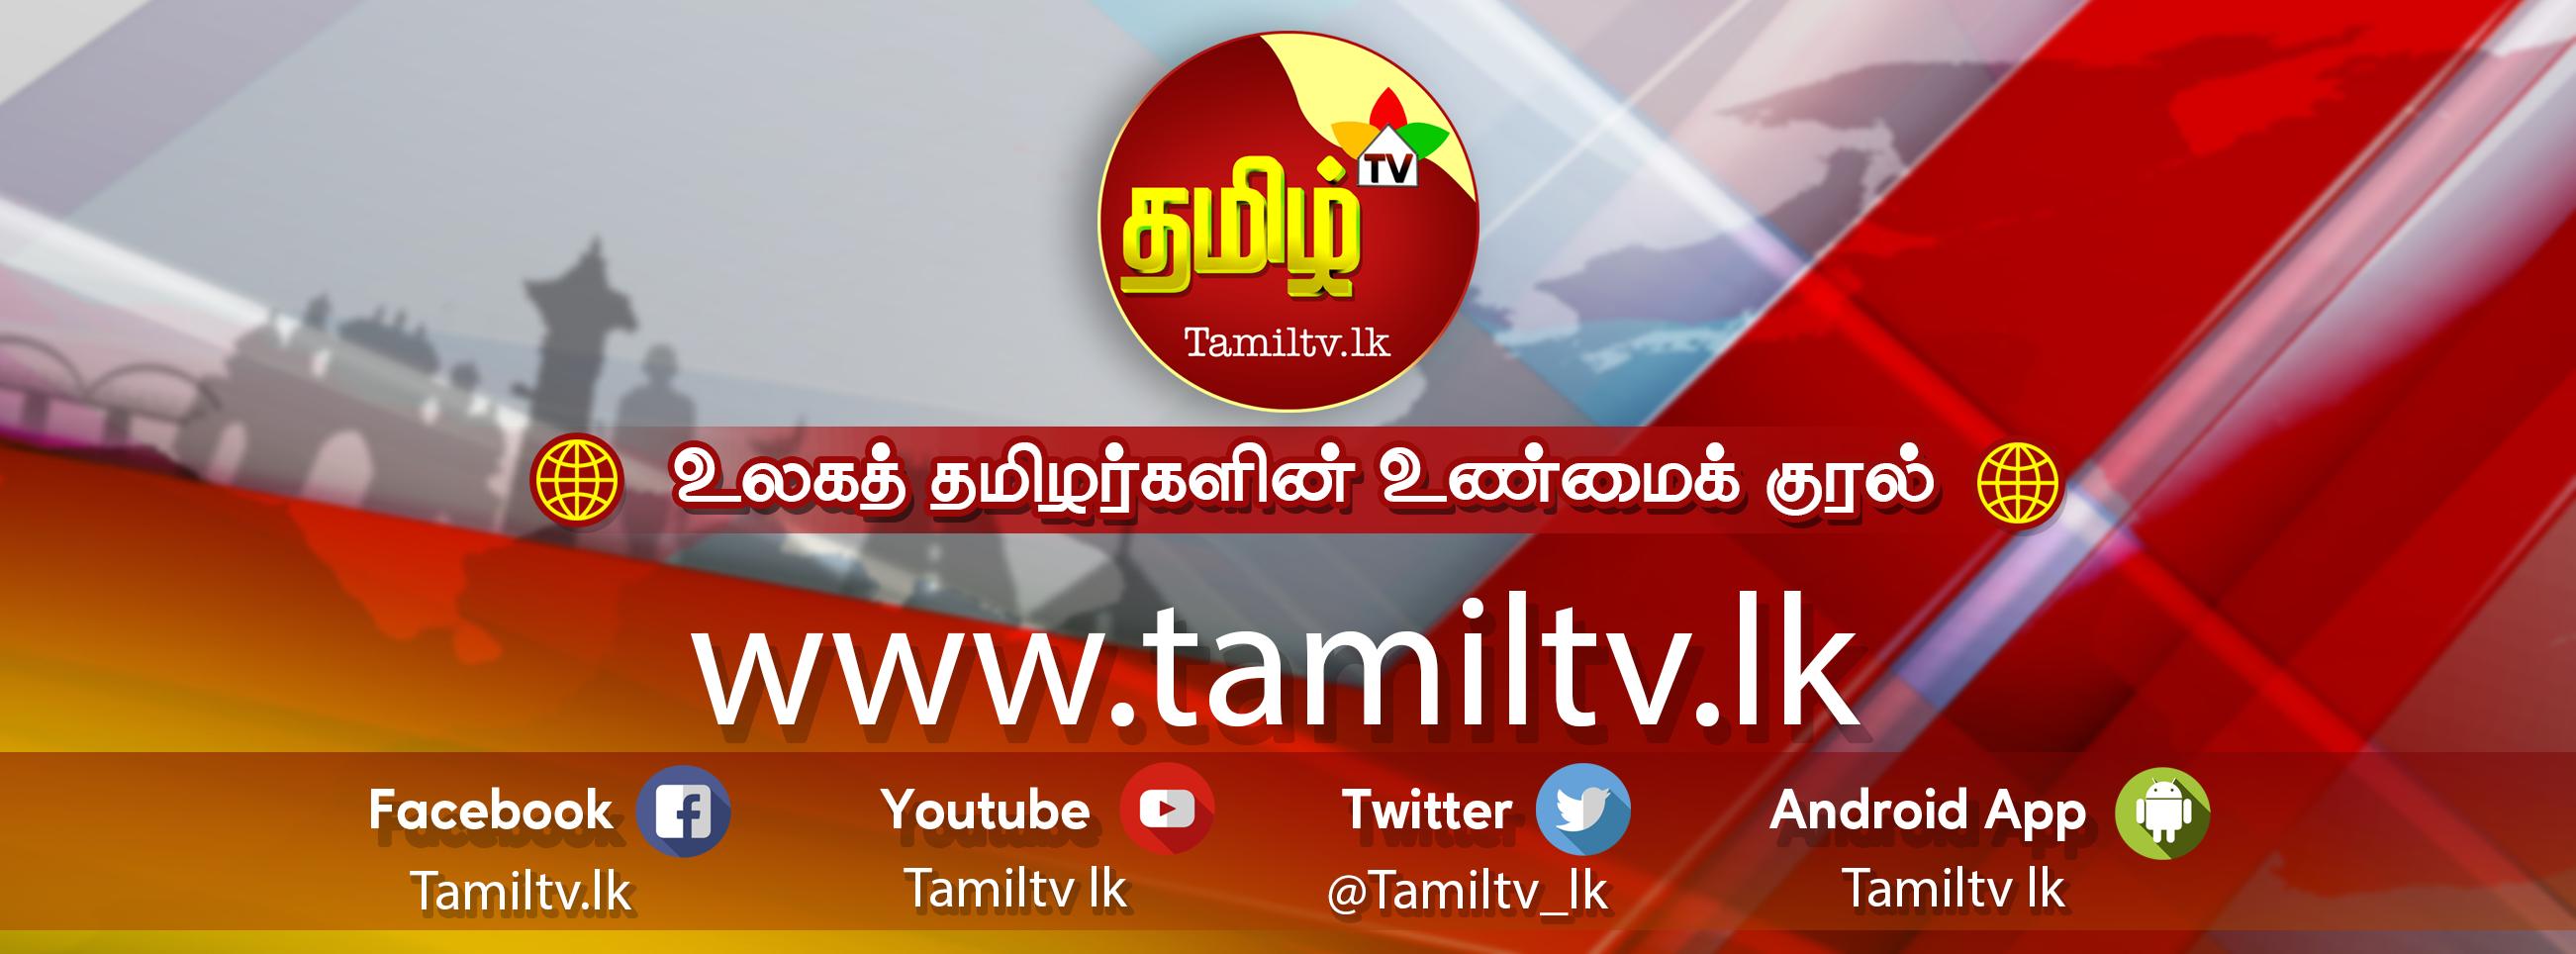 Tamiltv.lk